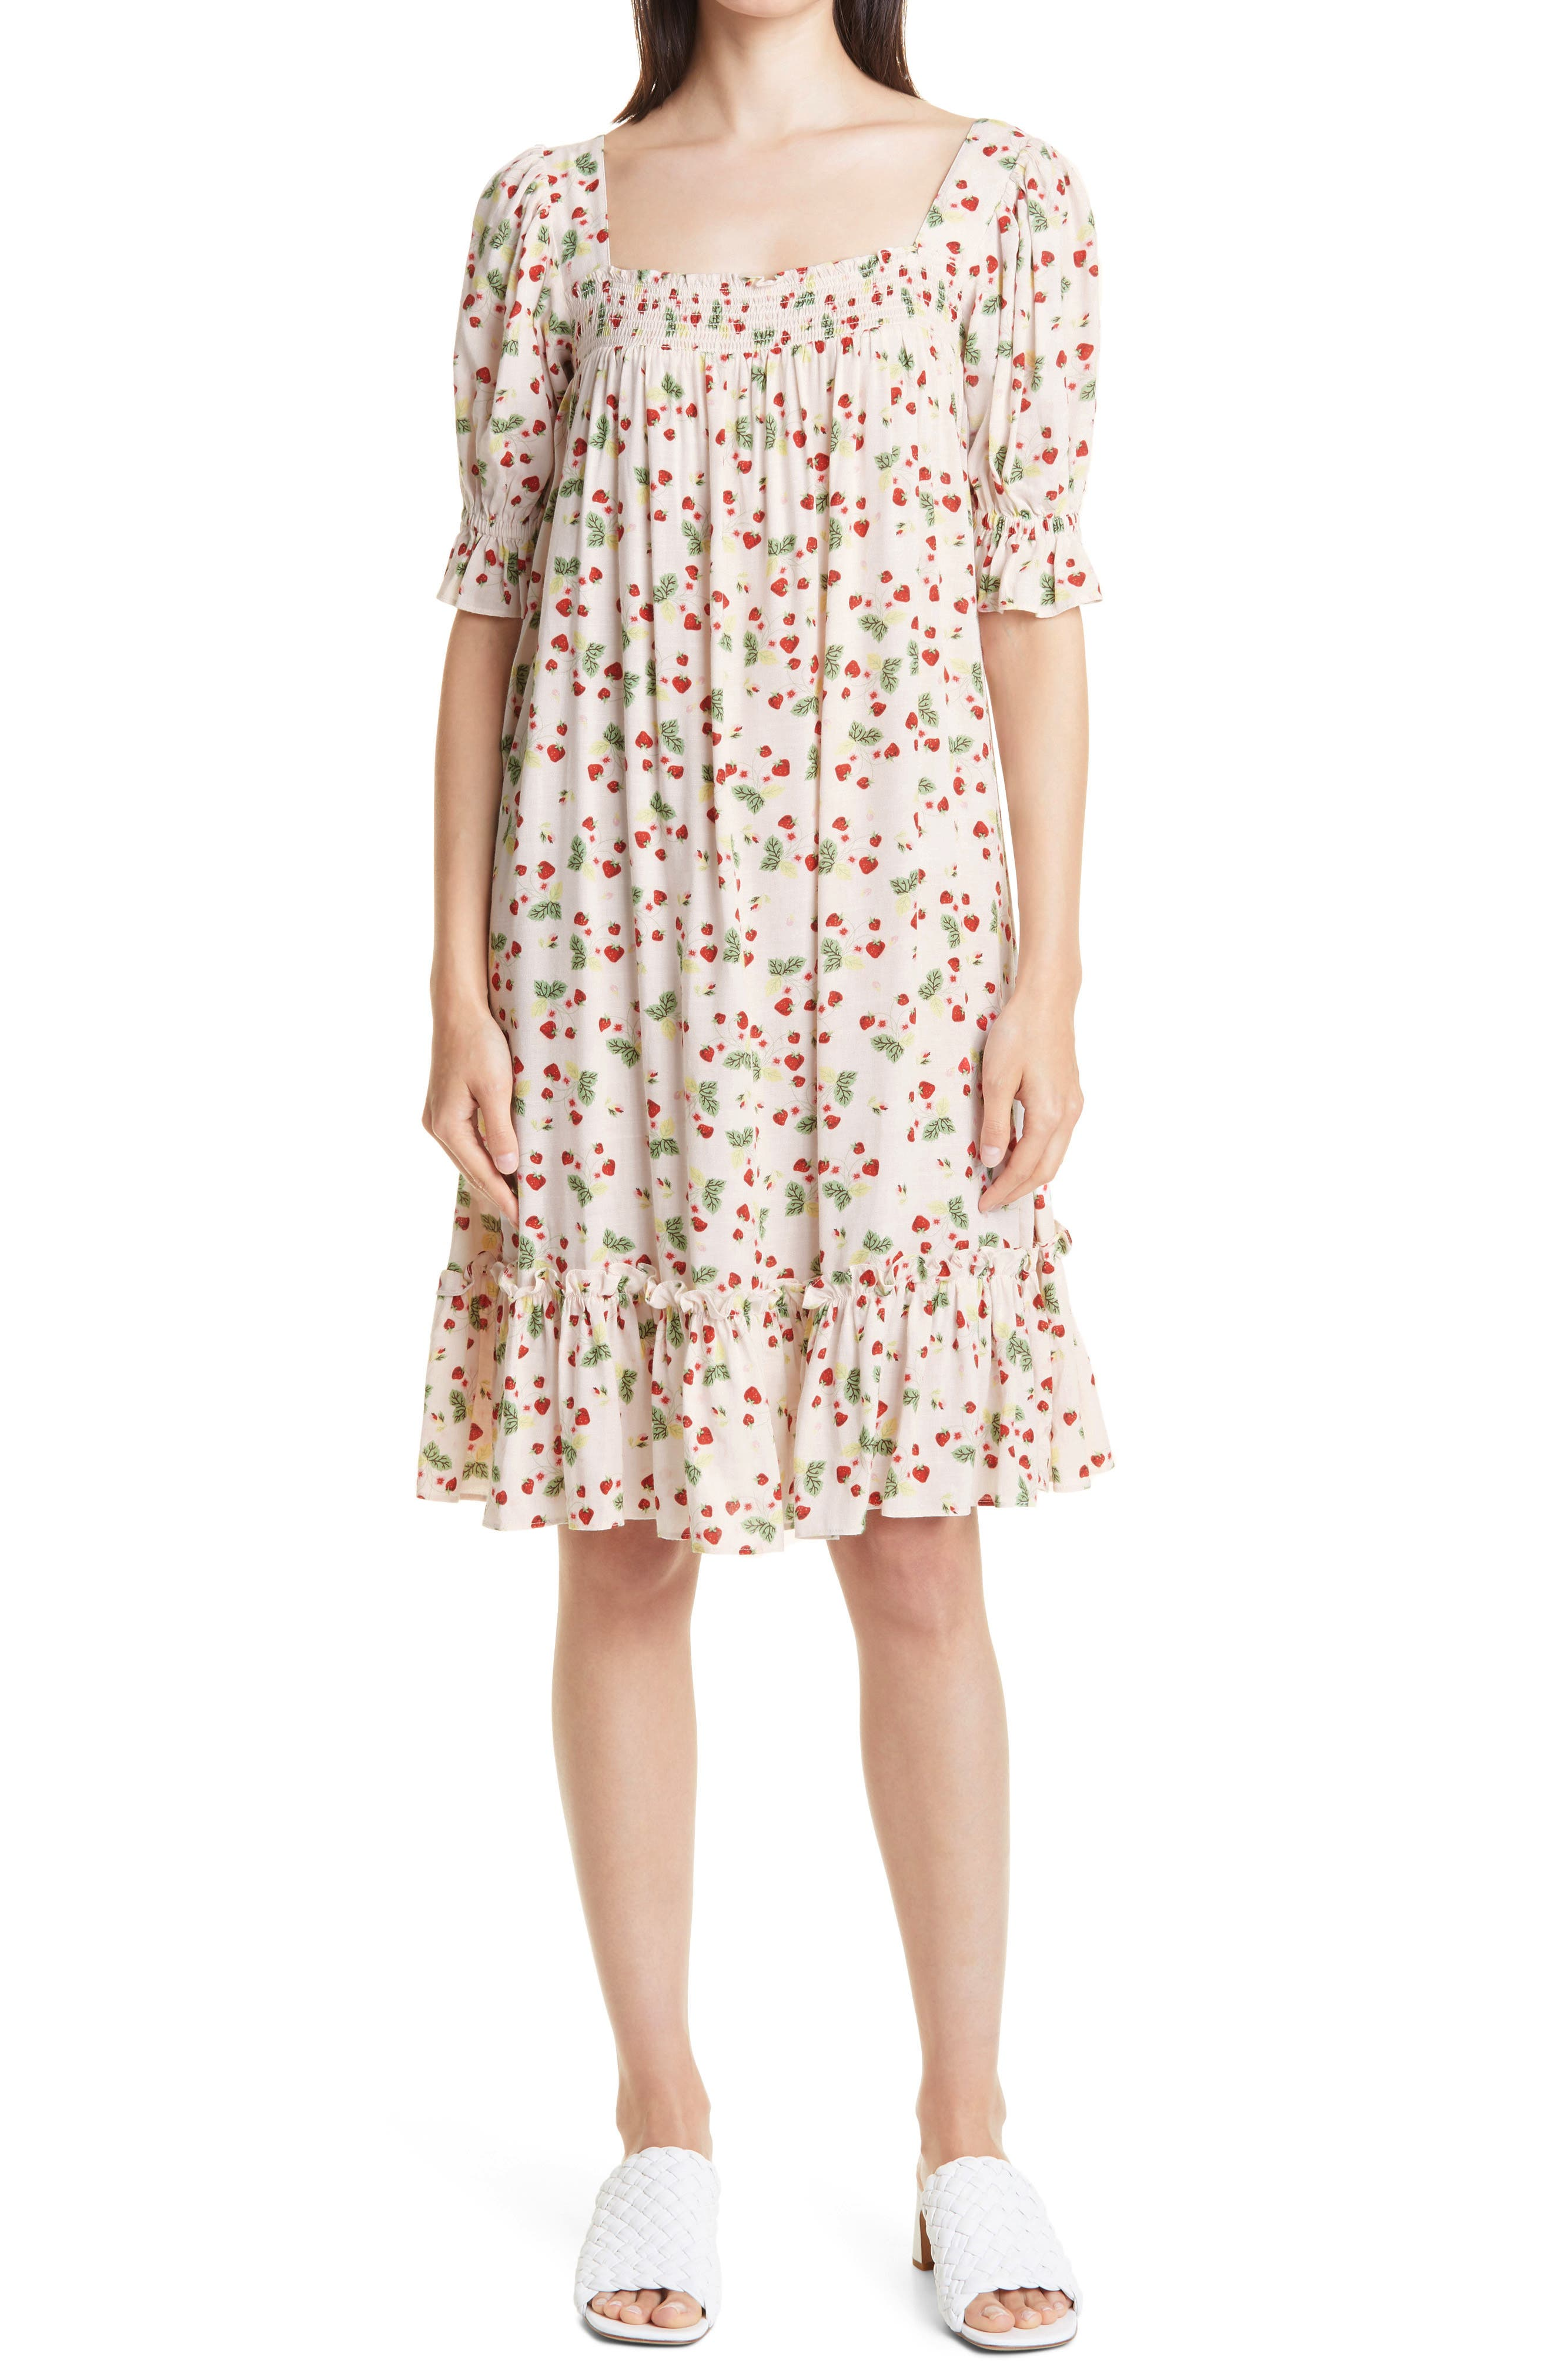 Smocked Yoke Babydoll Dress